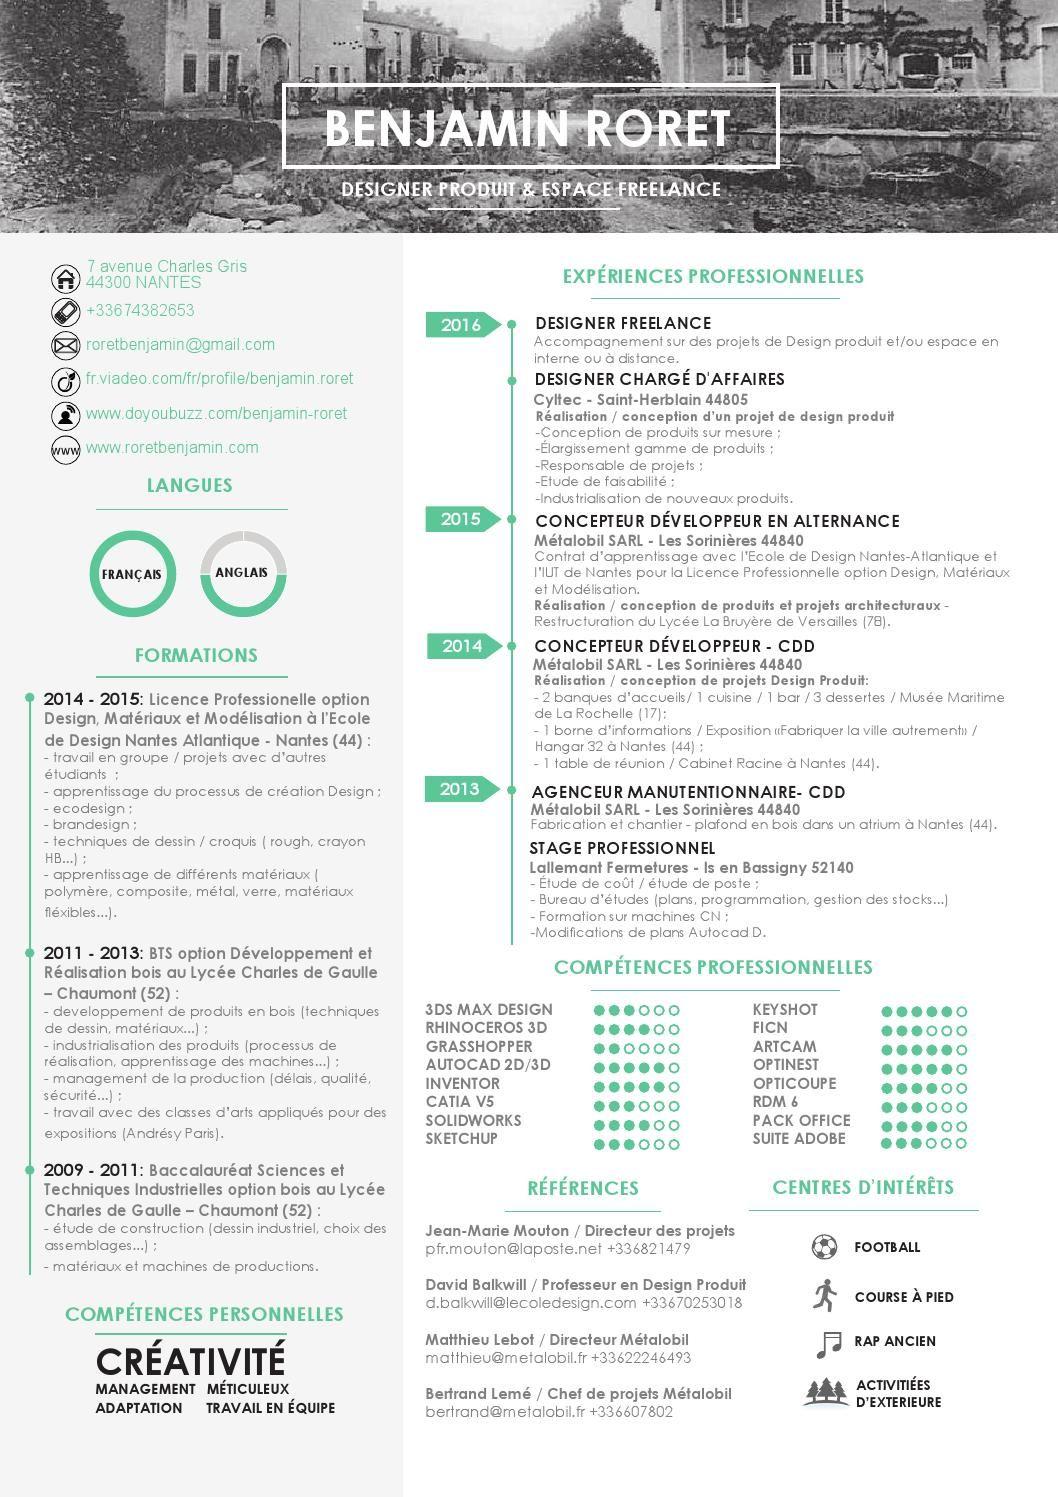 Cv Benjamin Roret Designer Produit Freelance Design Produit Modelisation Design